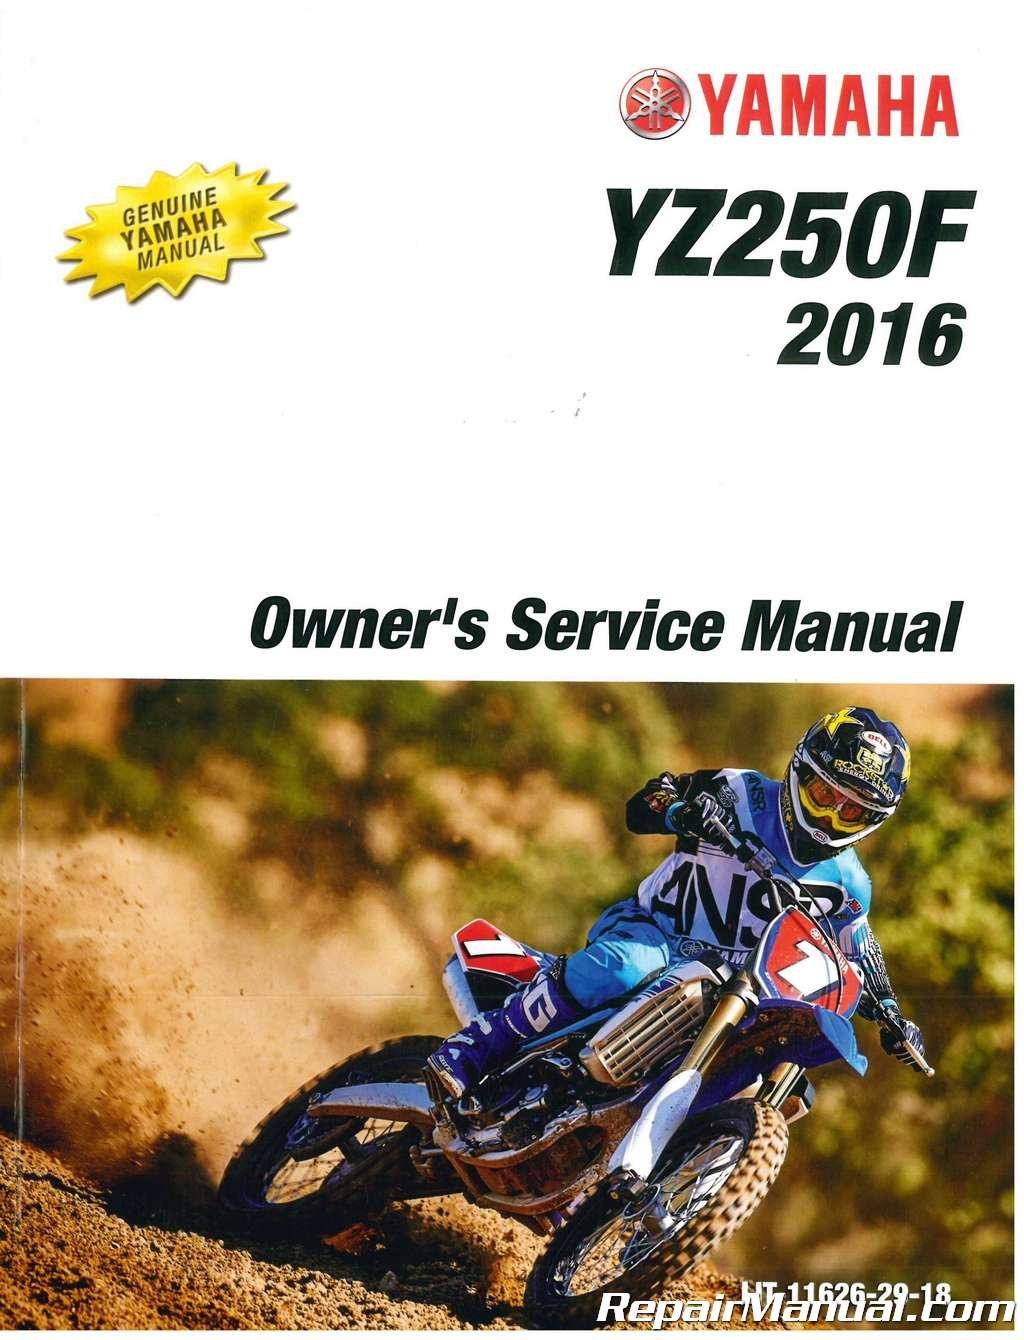 LIT-11626-29-18 2016 Yamaha YZ250F Motorcycle Owners Service Manual:  Manufacturer: Amazon.com: Books